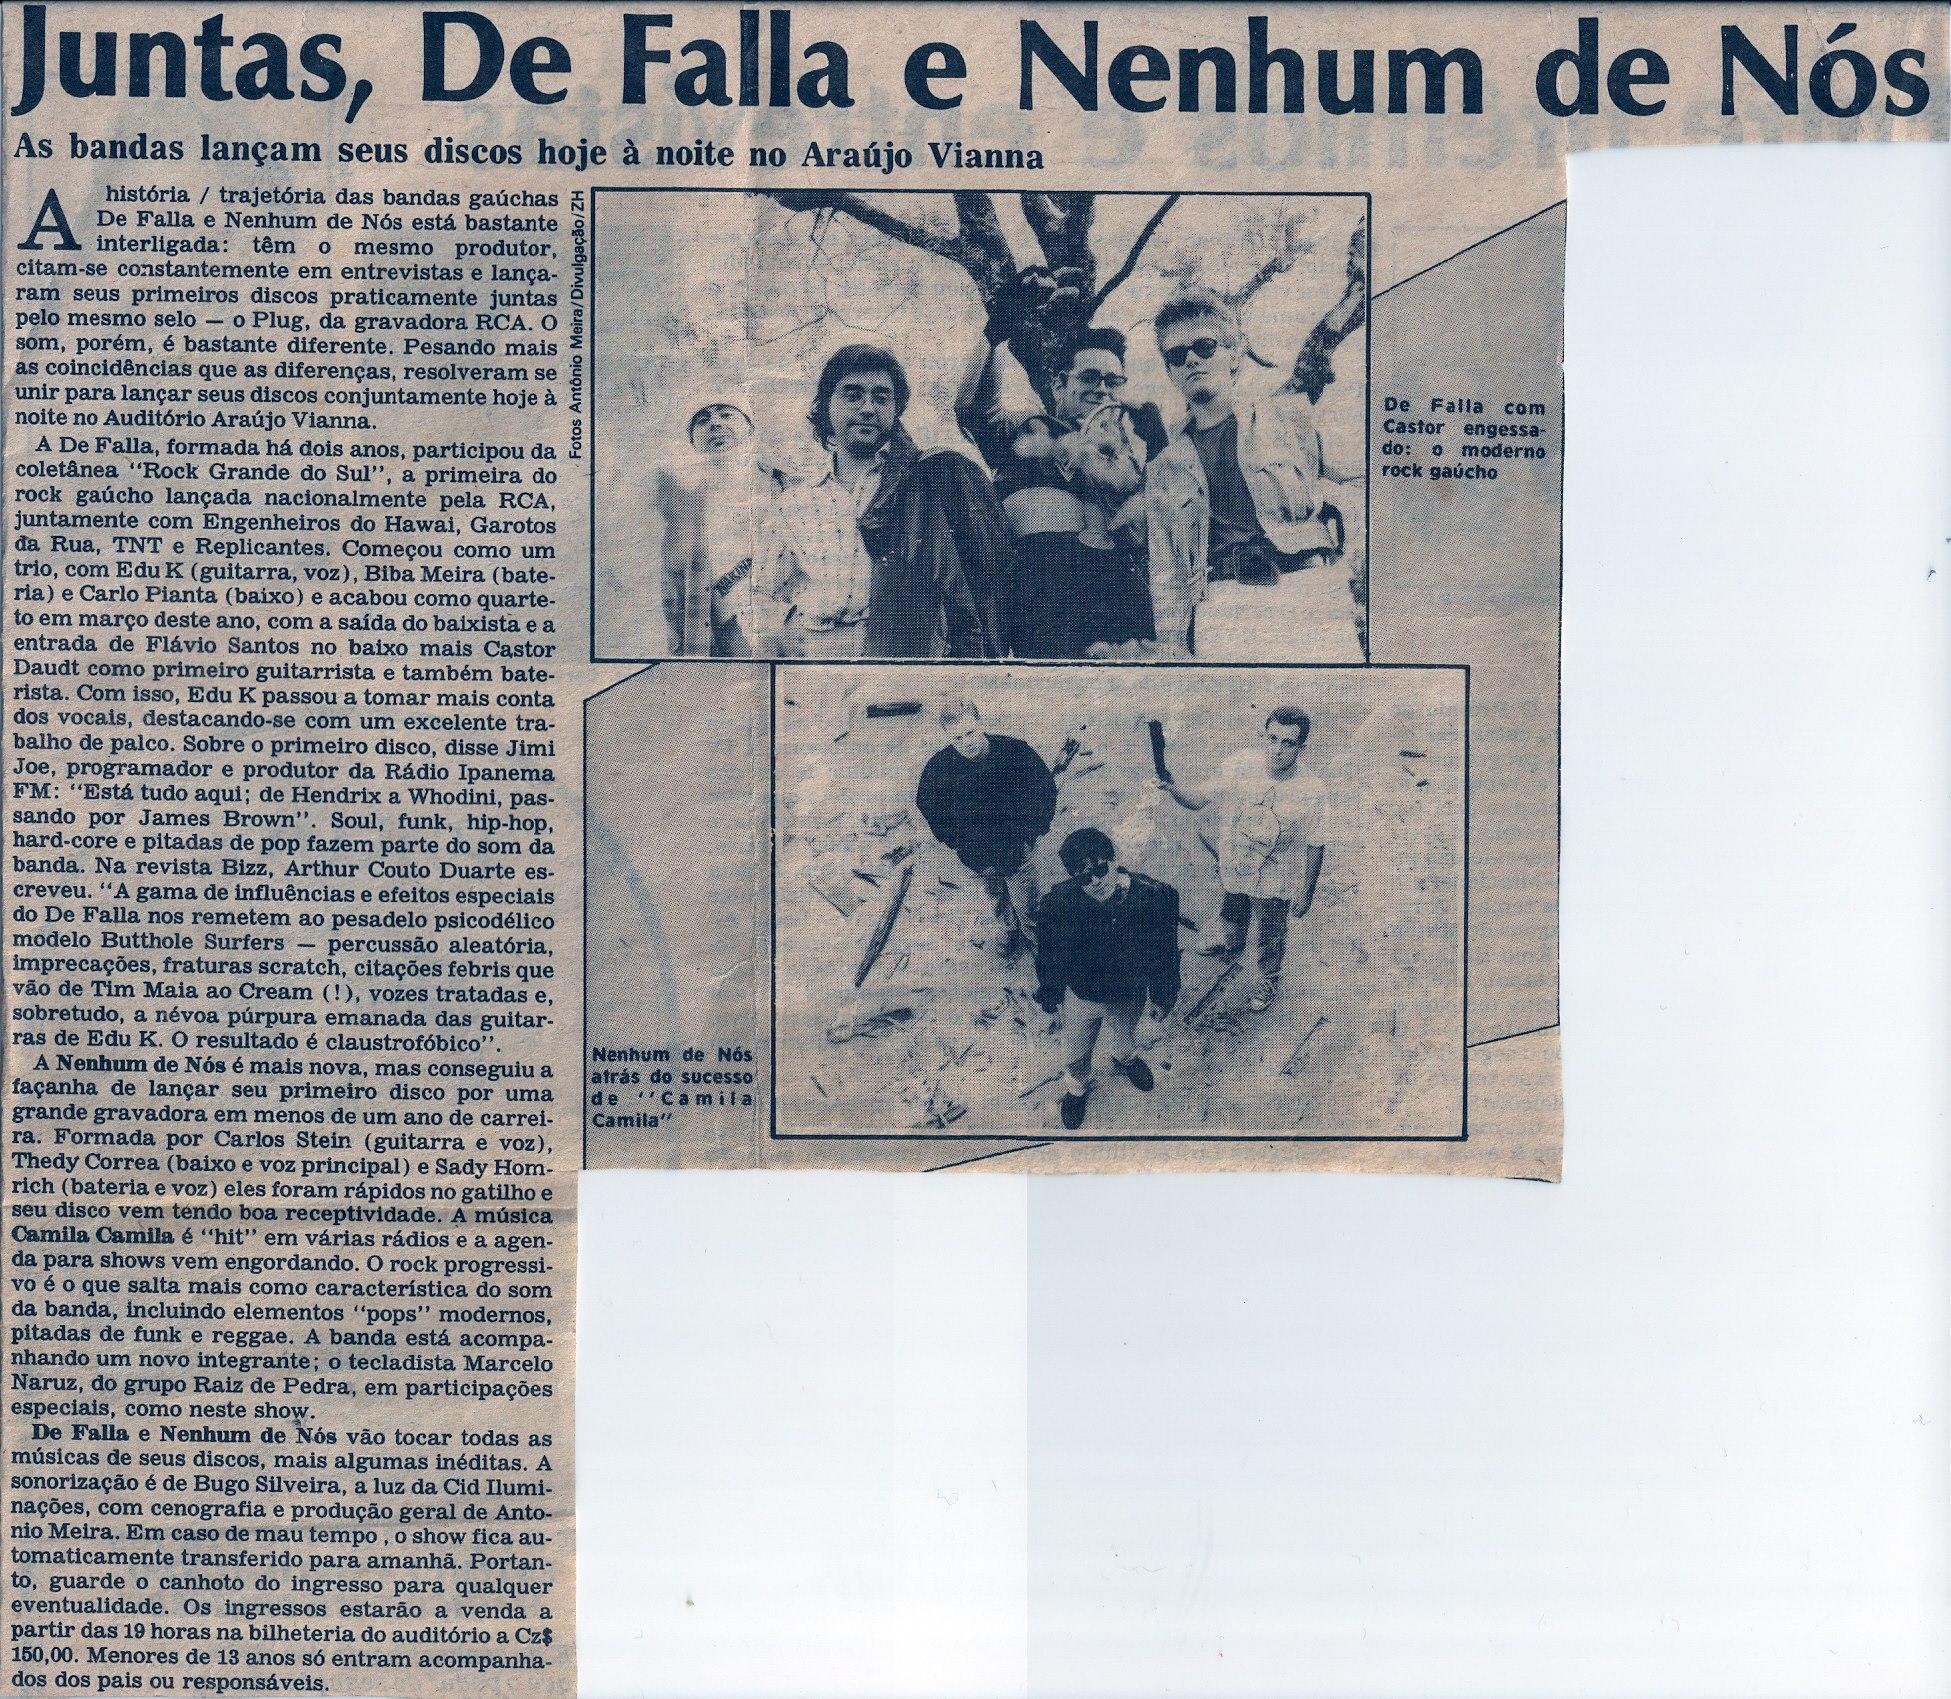 [PRESS] Juntas, DeFalla e Nenhum de Nós no Araújo Vianna